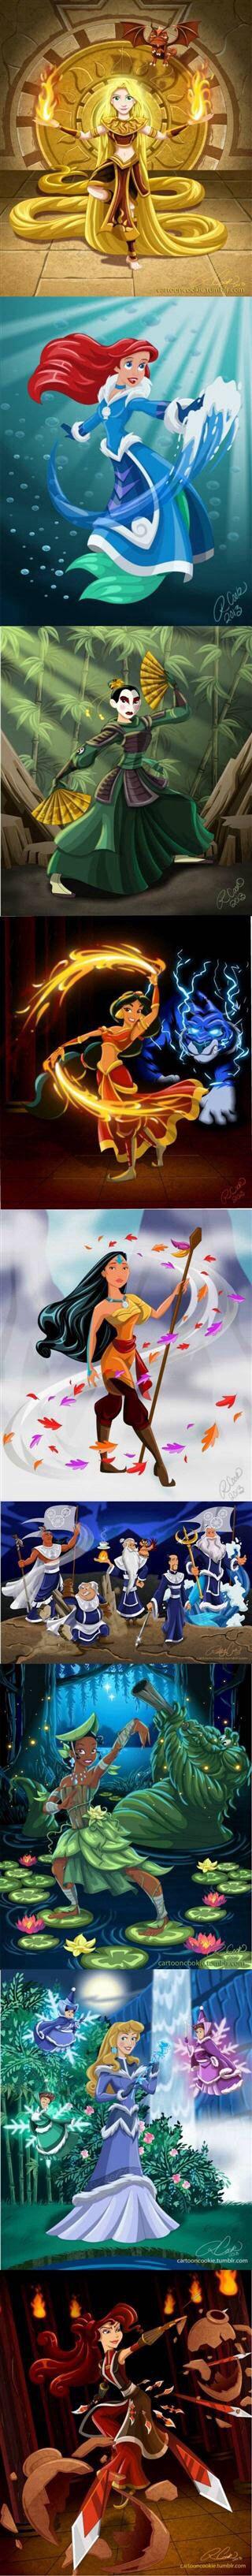 Disney princess ELEMENT STYLE